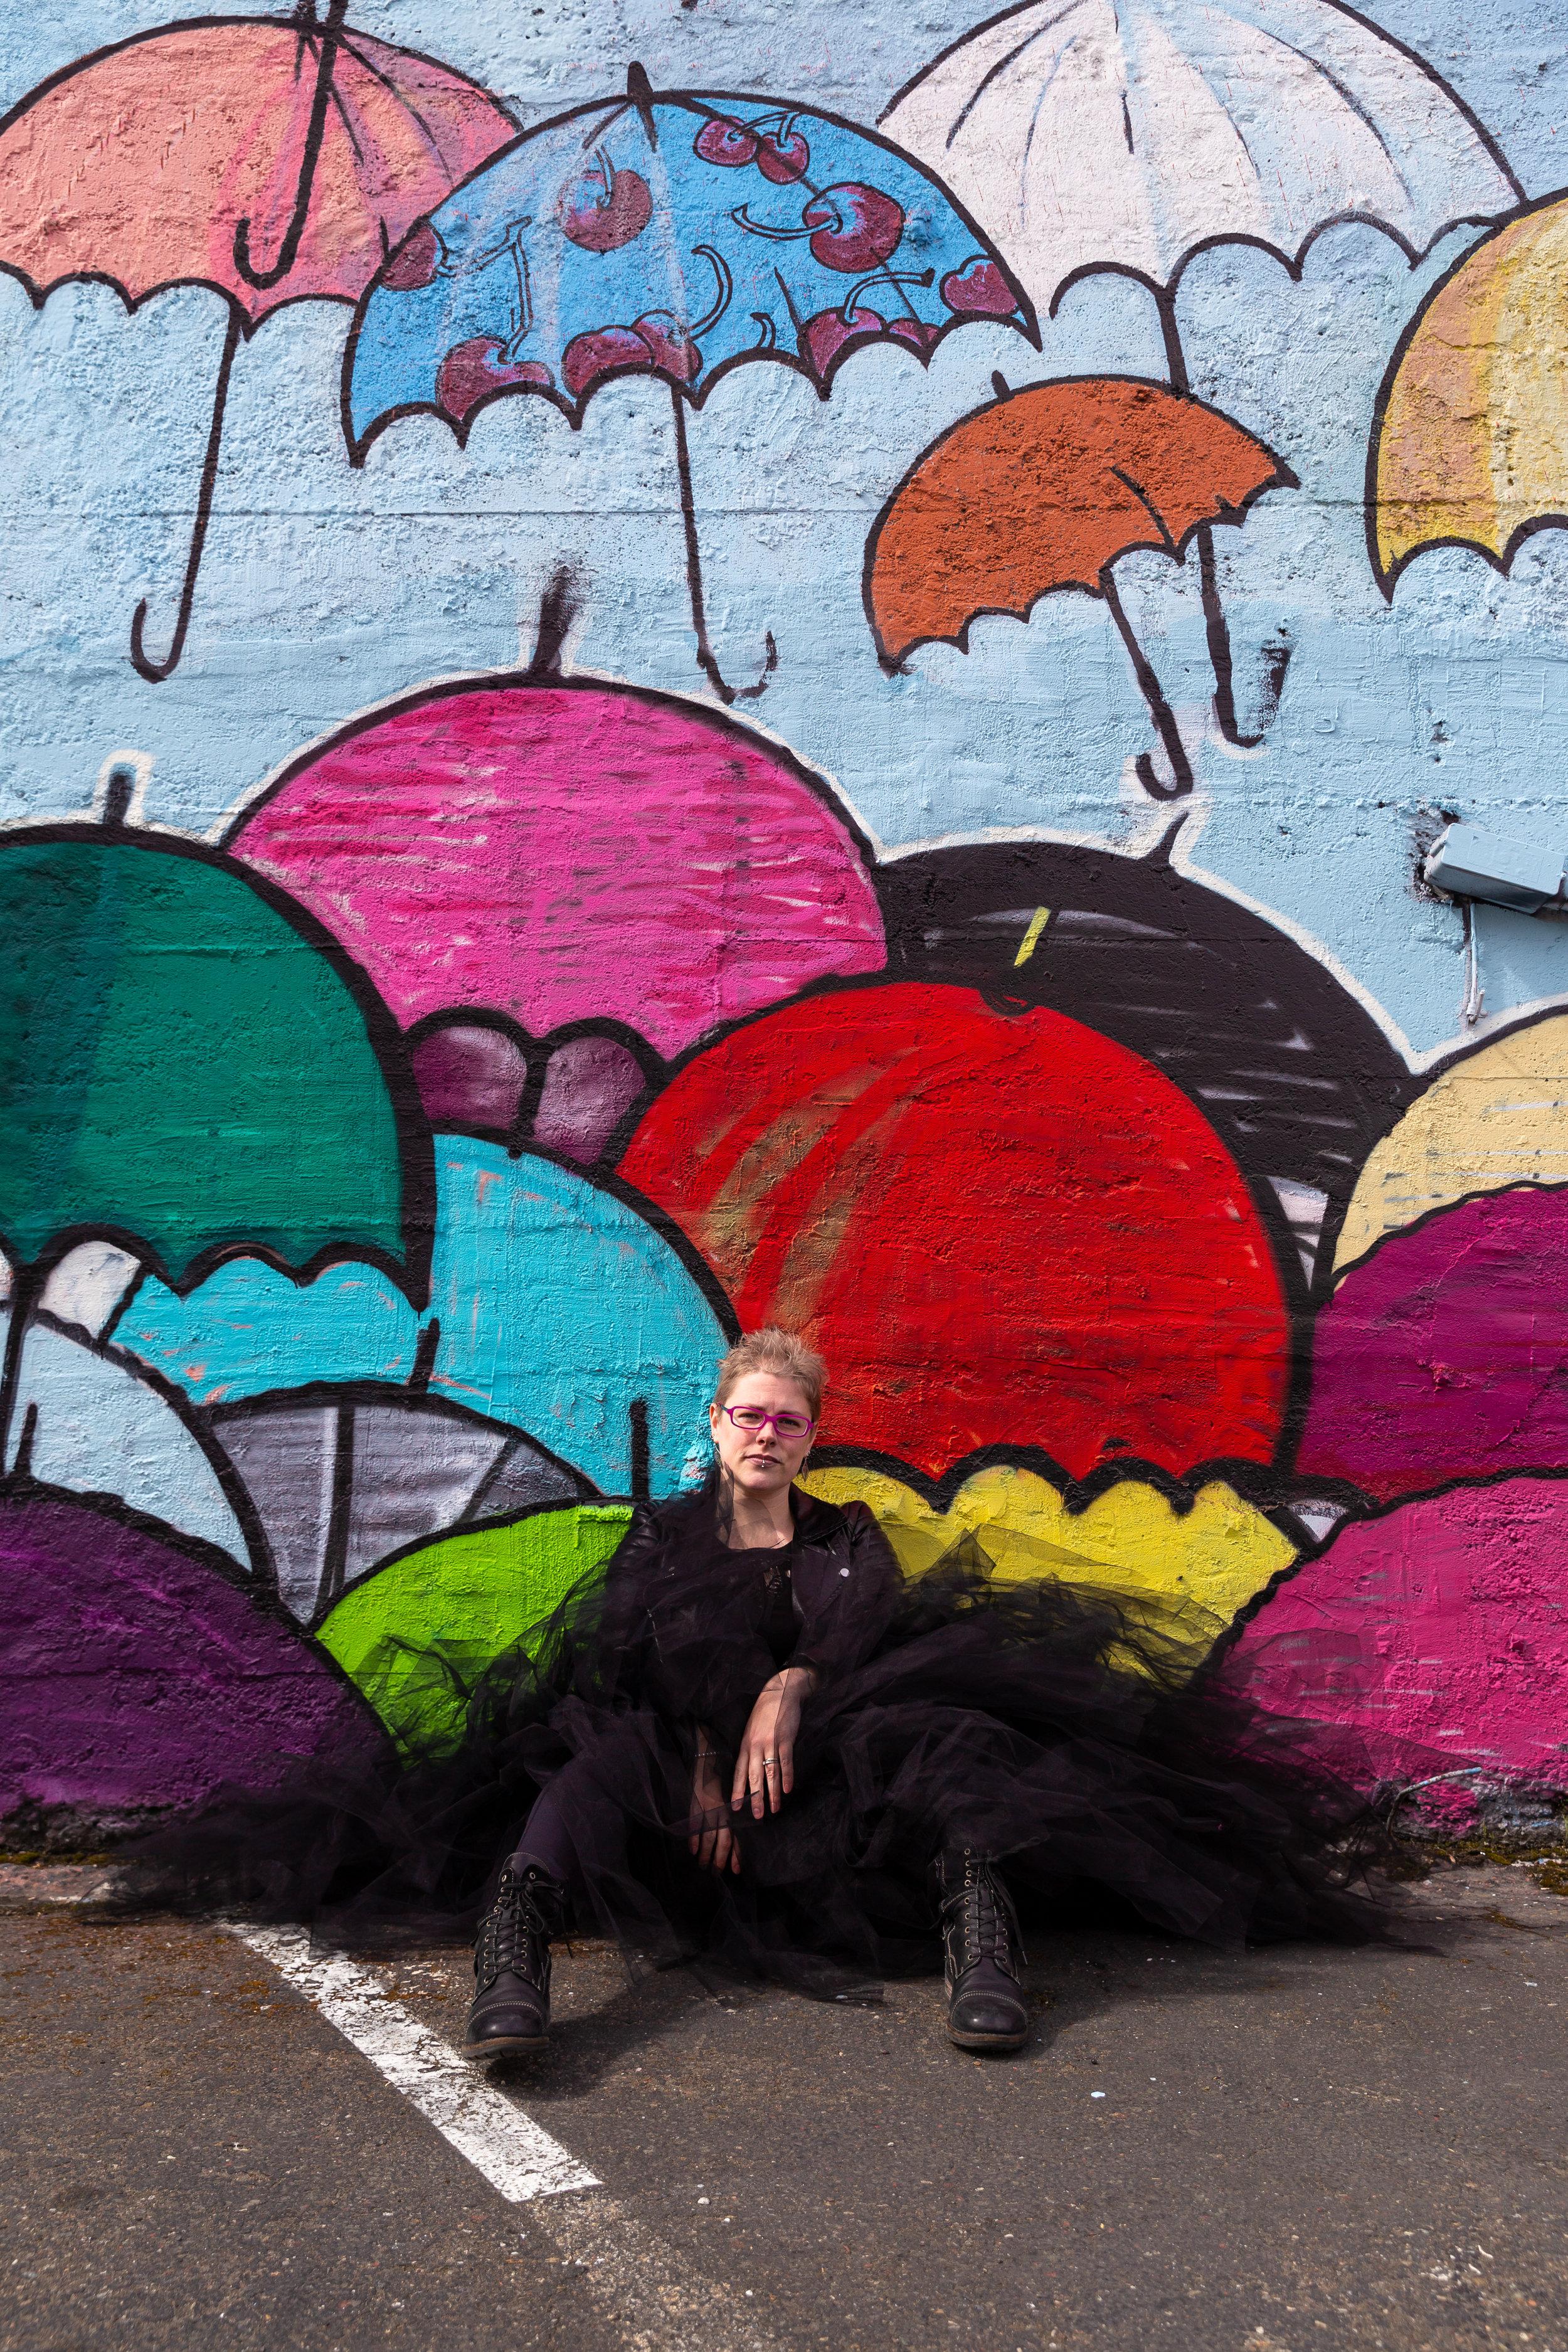 Abby murray umbrella creative headshots jenny miller april 6 2019 (33 of 49).jpg